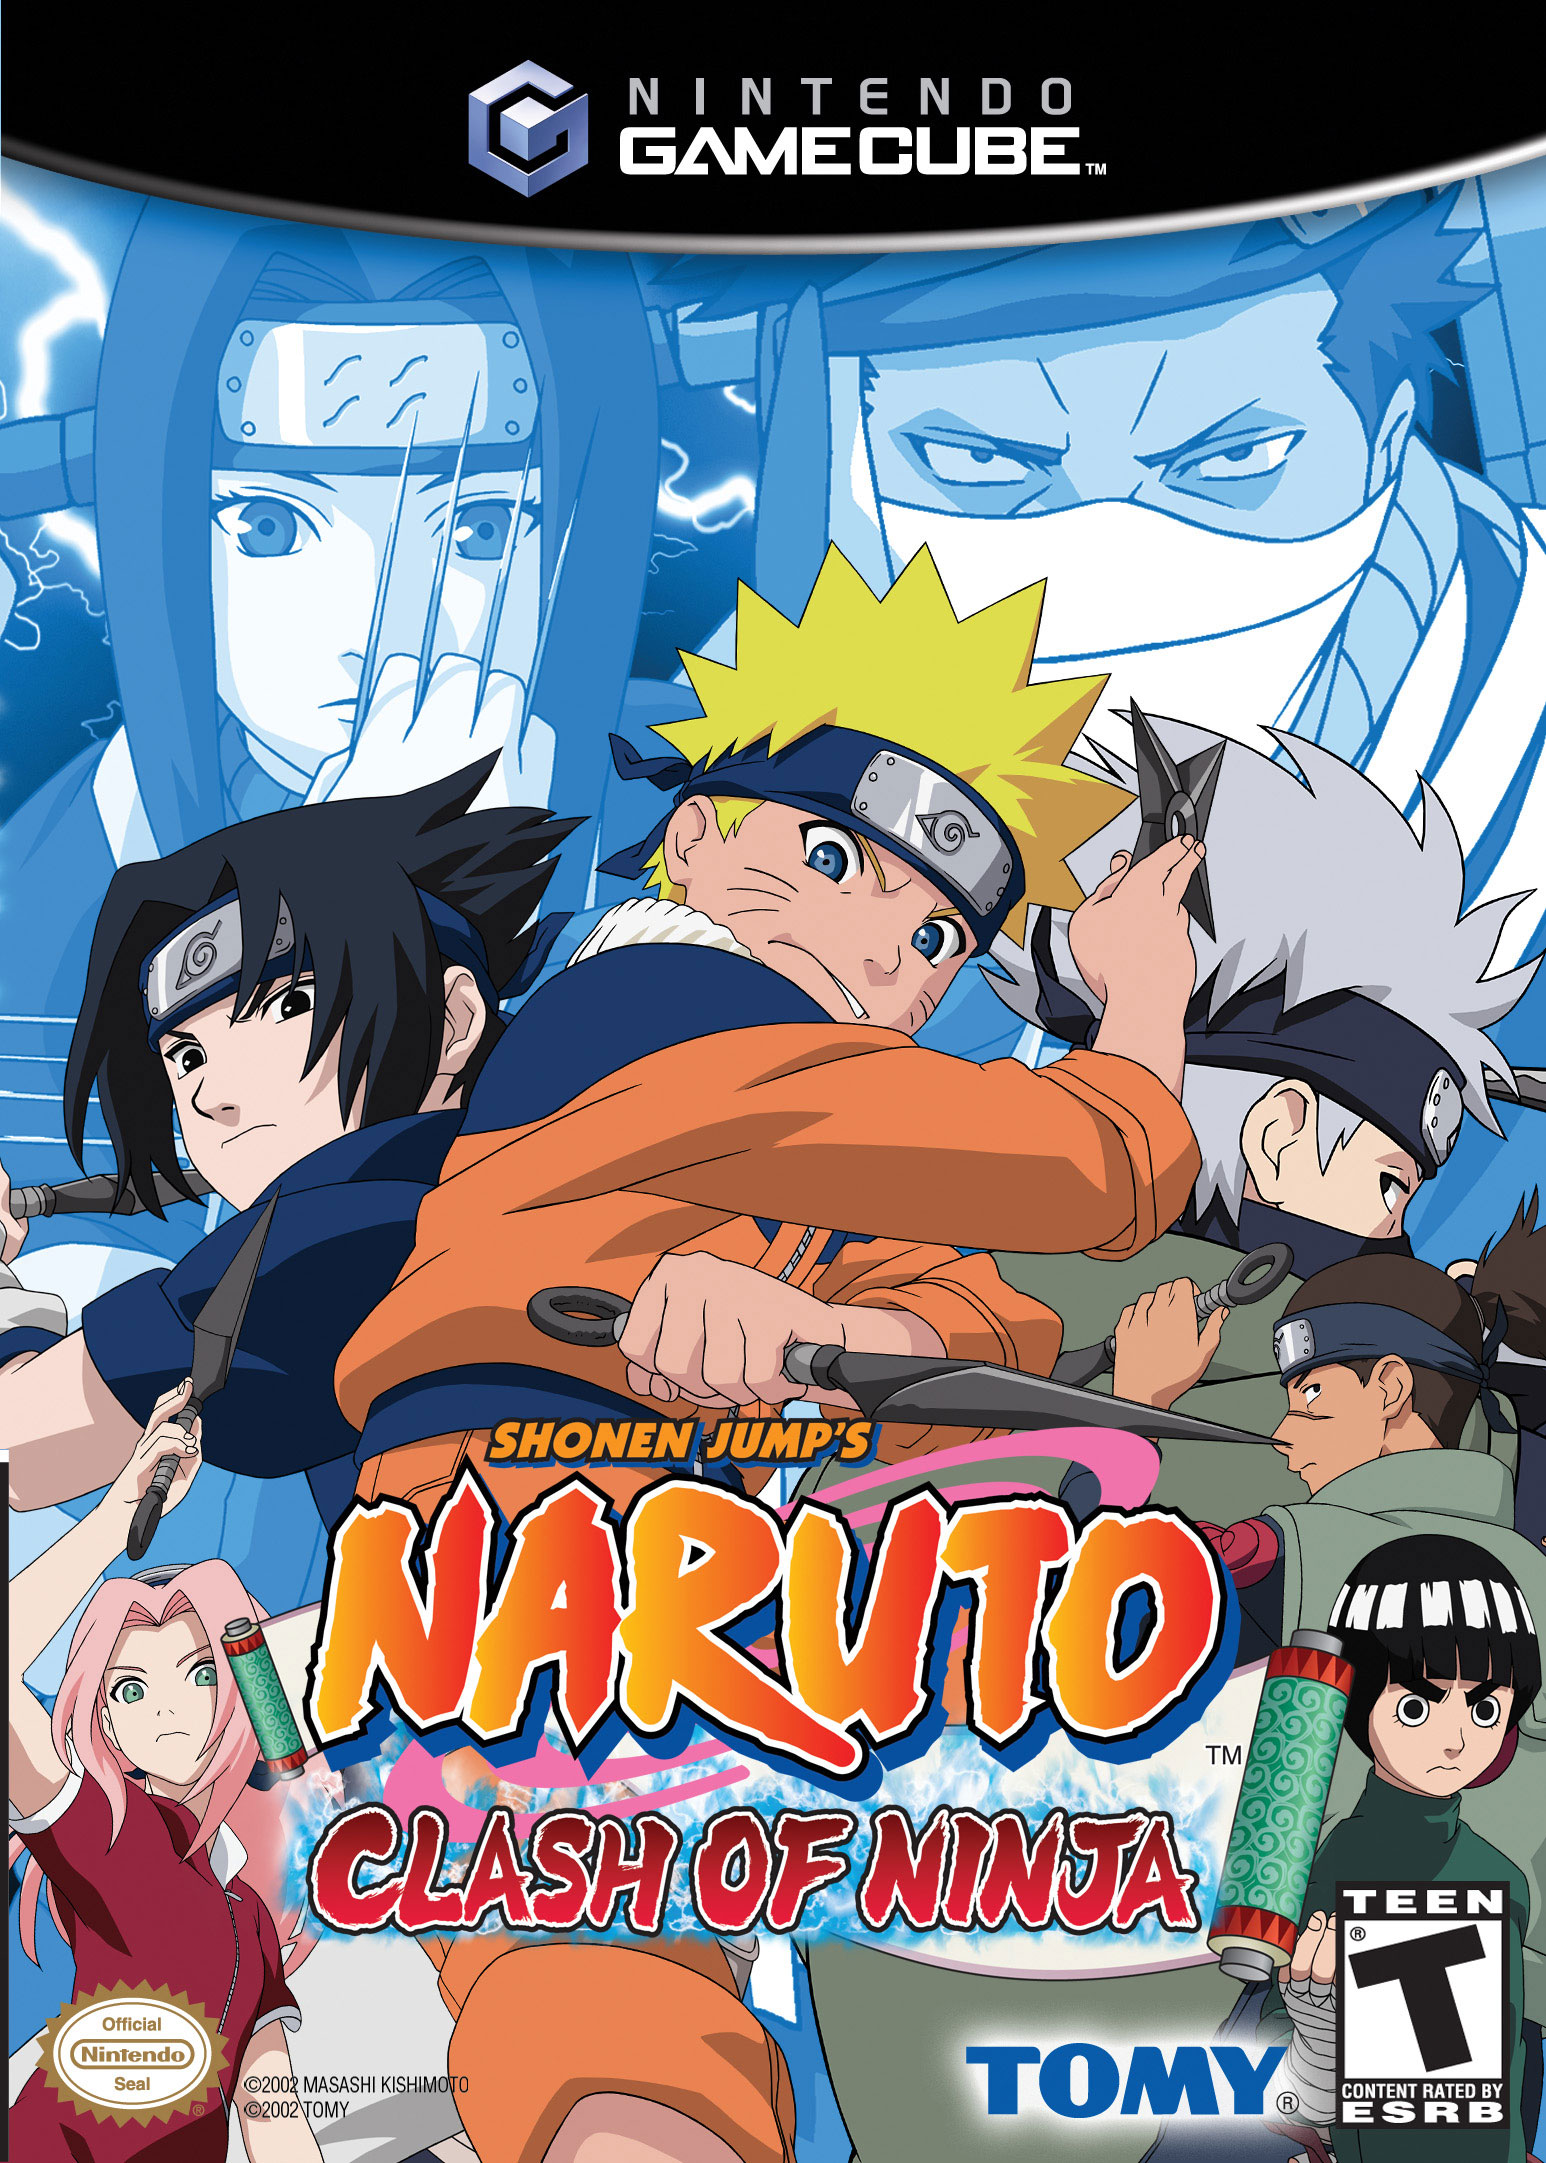 Naruto: Clash of Ninja | Narutopedia | FANDOM powered by Wikia